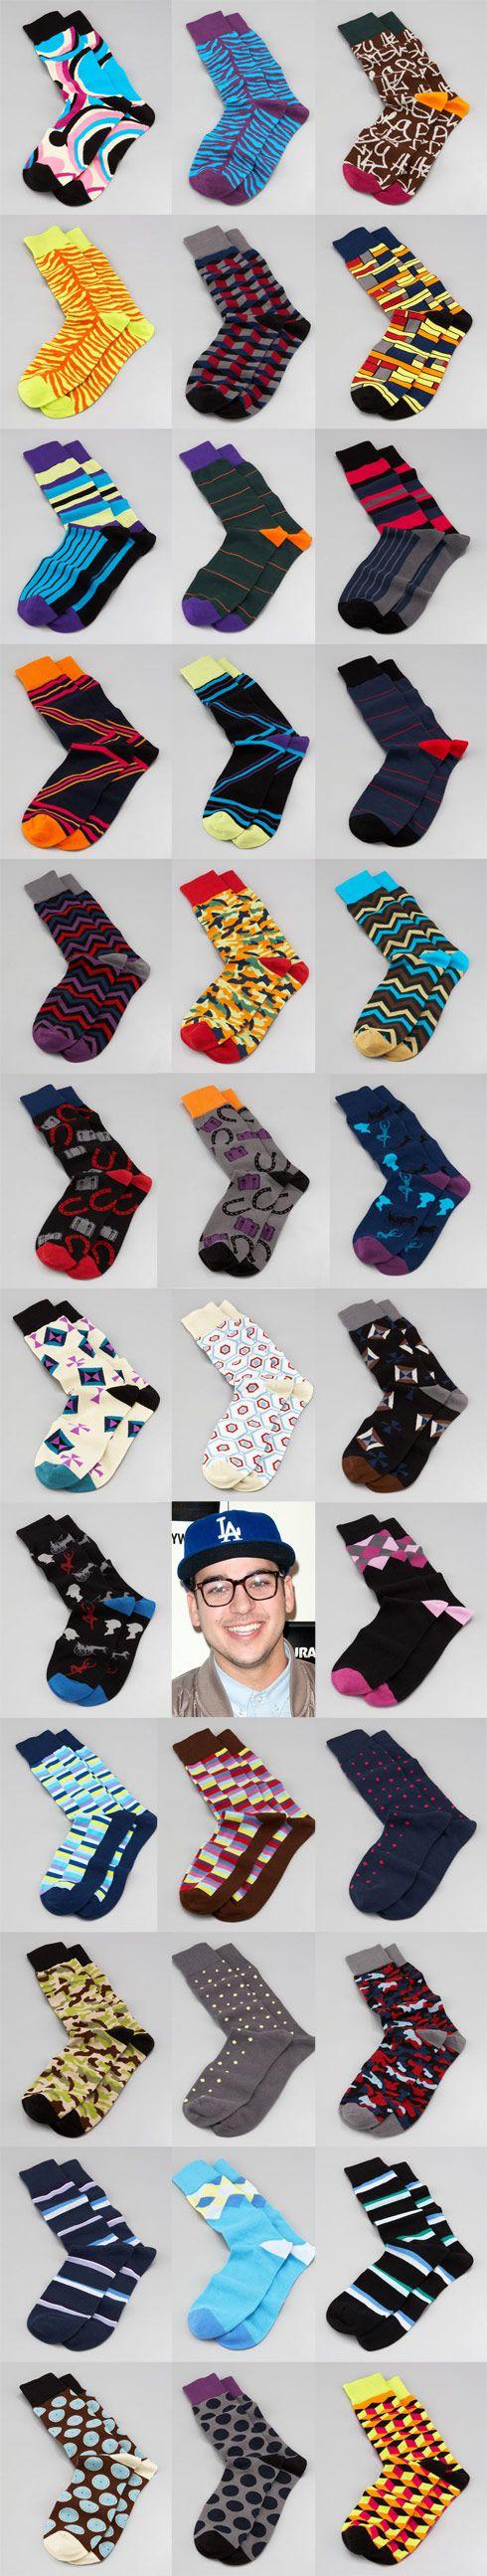 Arthur-George-socks - Rob Kardashian